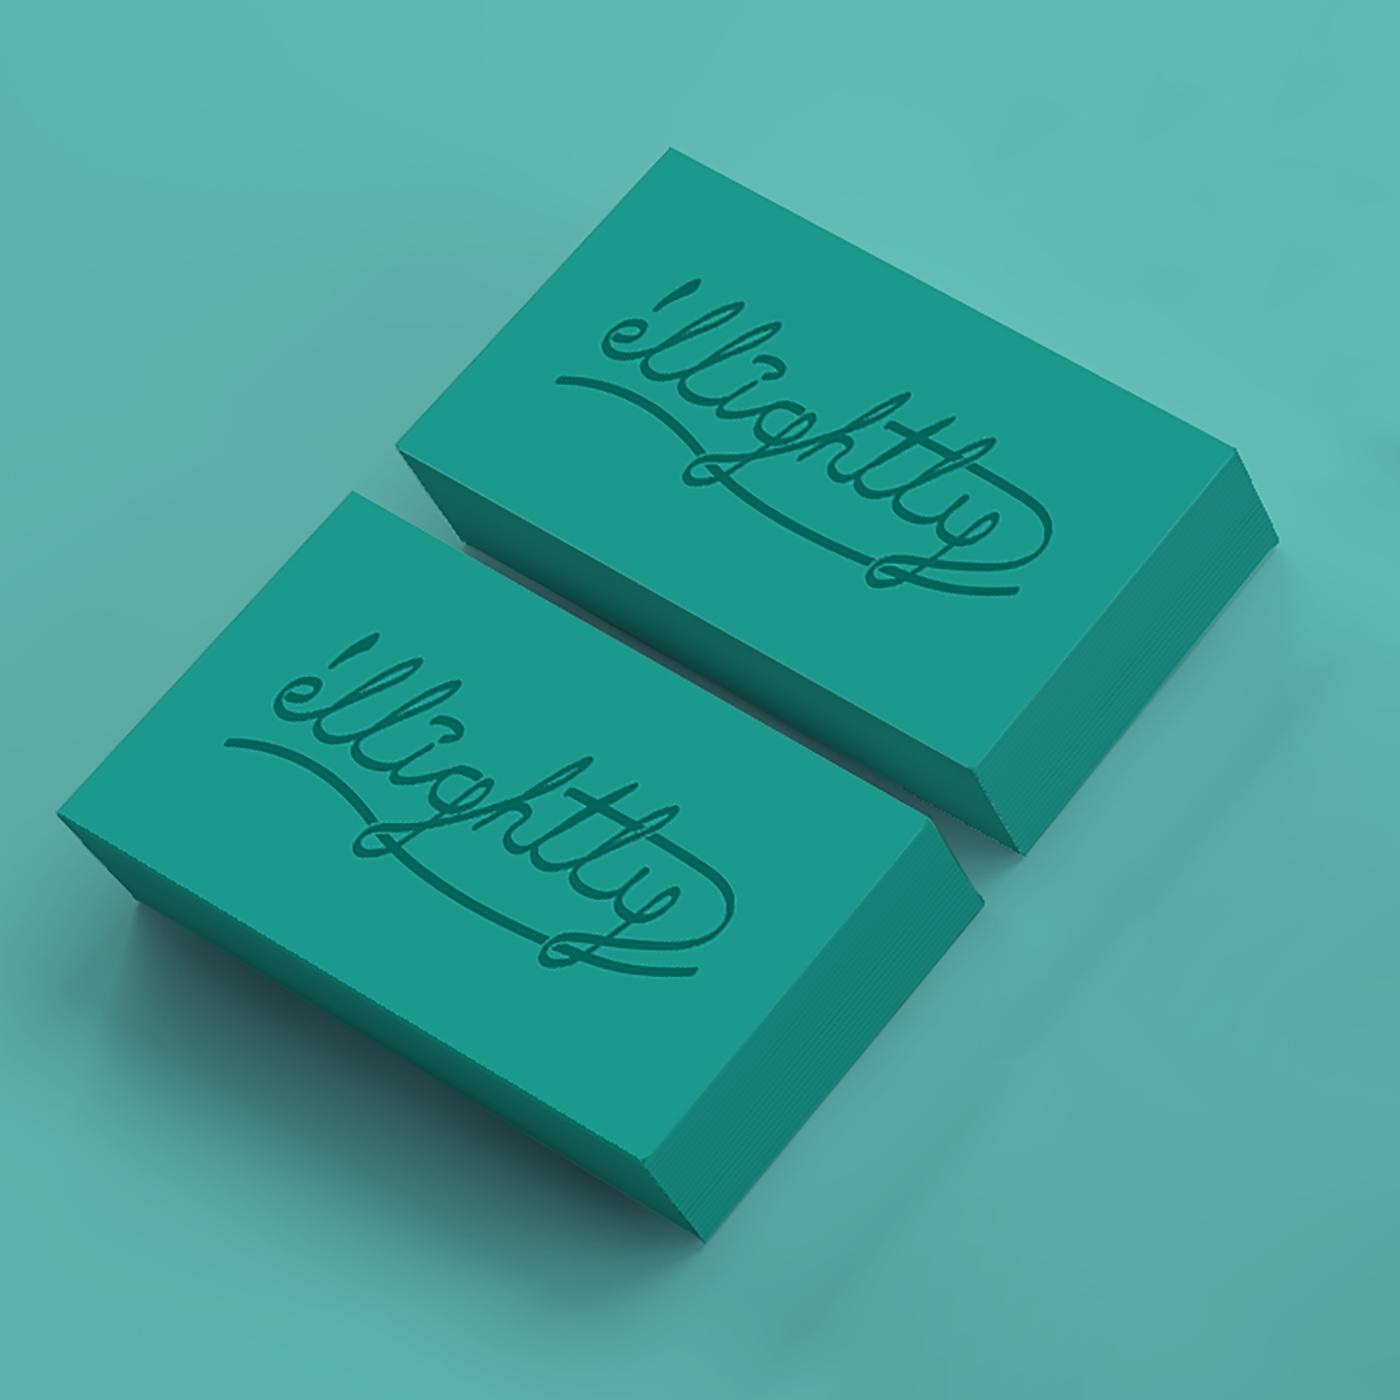 Business Card Design by Pavlo Futruk